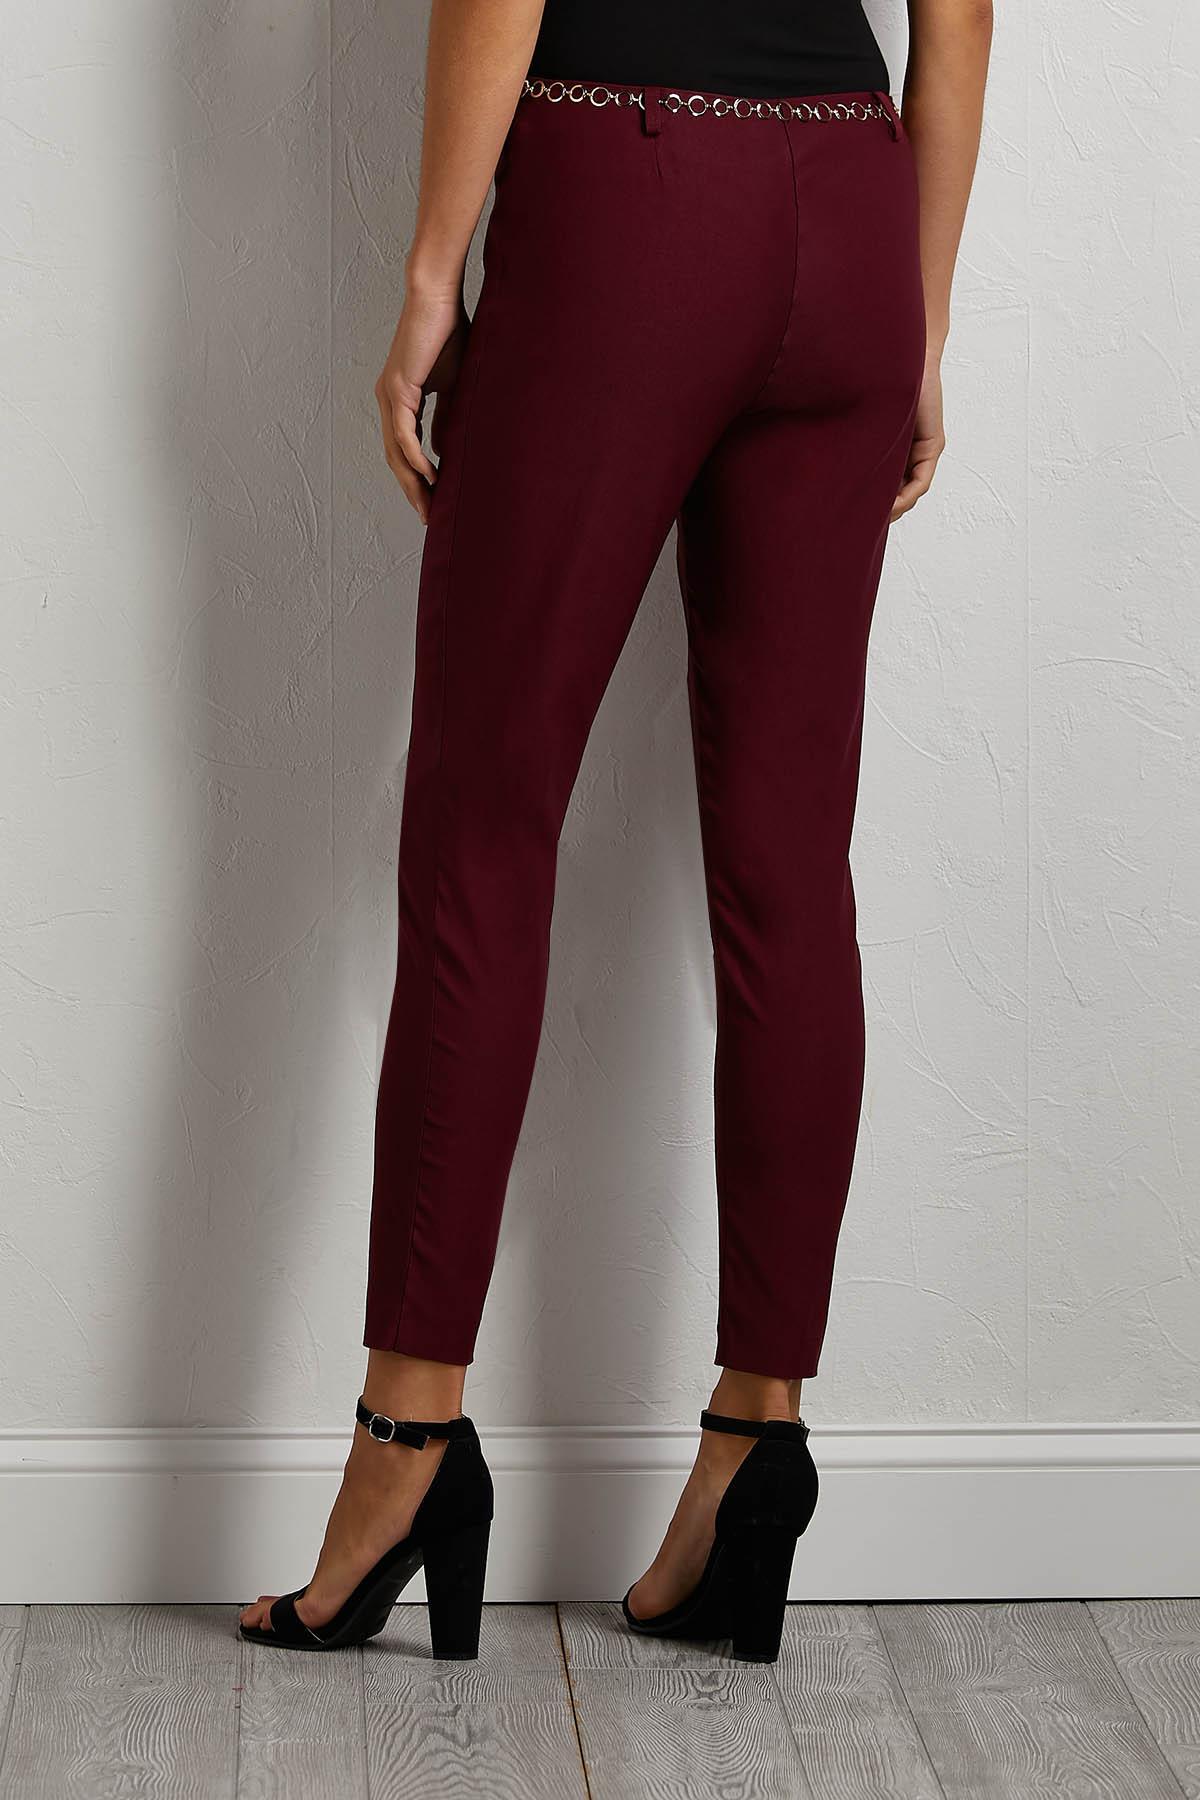 Sweet And Sassy Pants